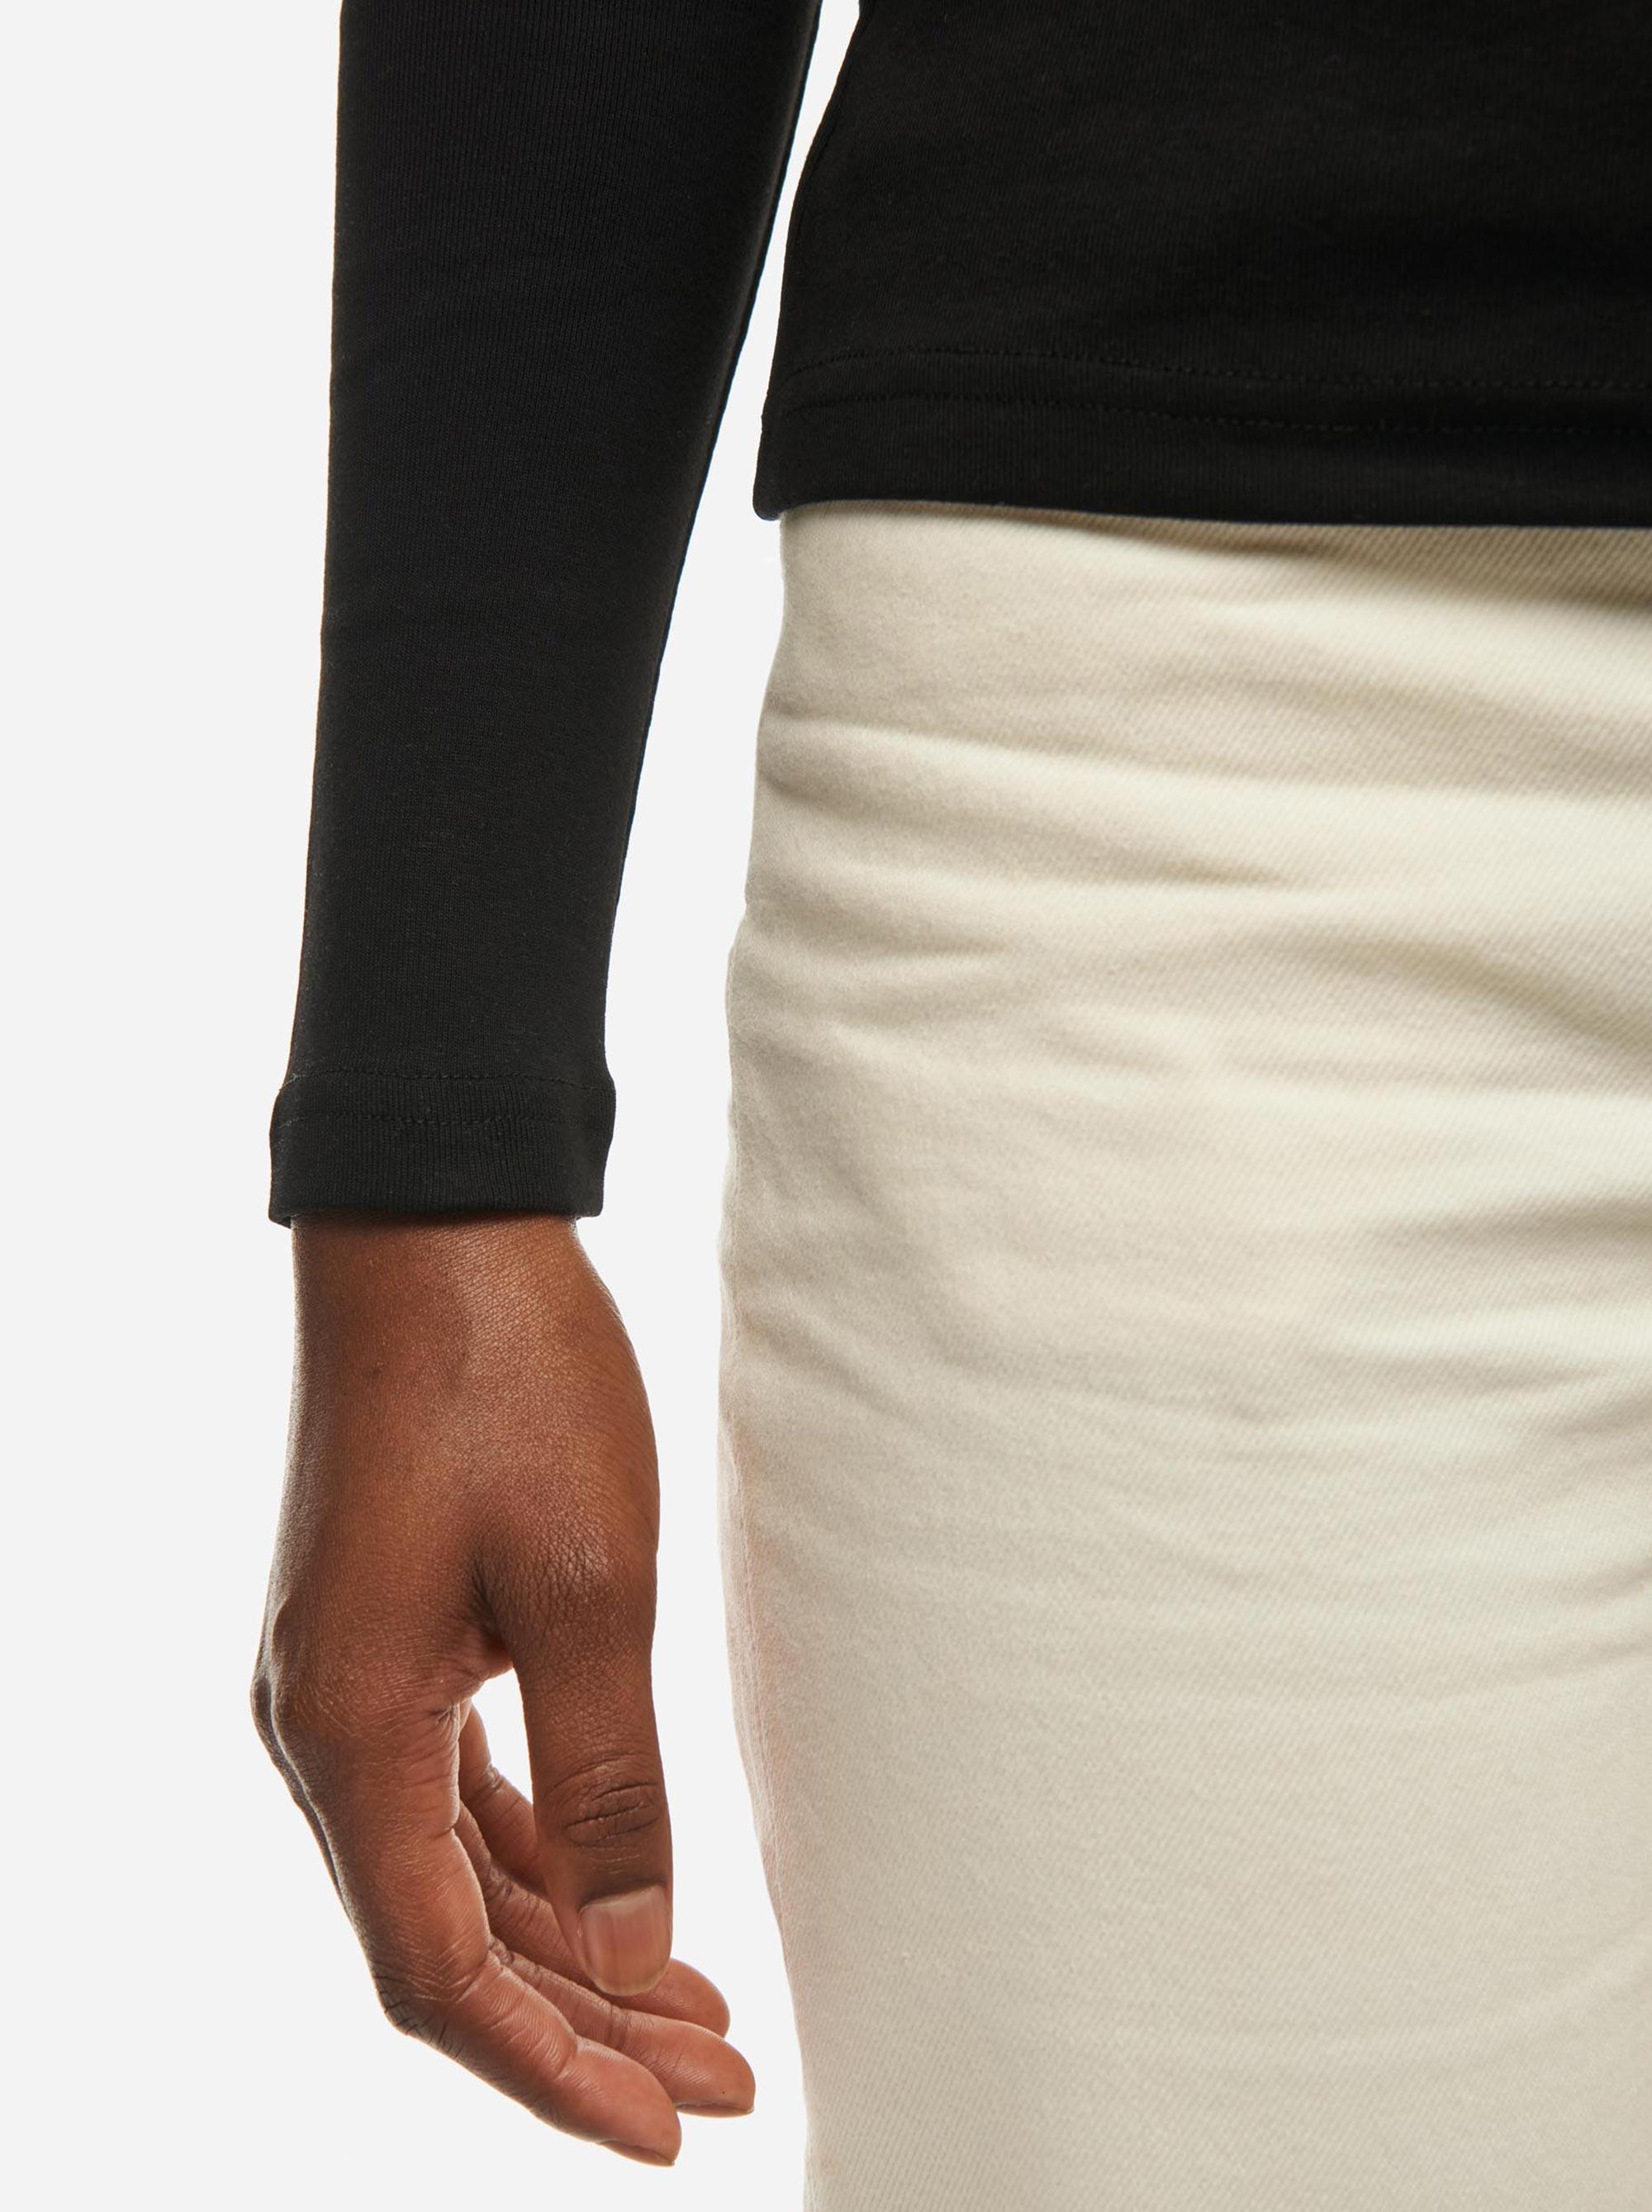 Teym - The-T-Shirt - Longsleeve - Women - Black - 1